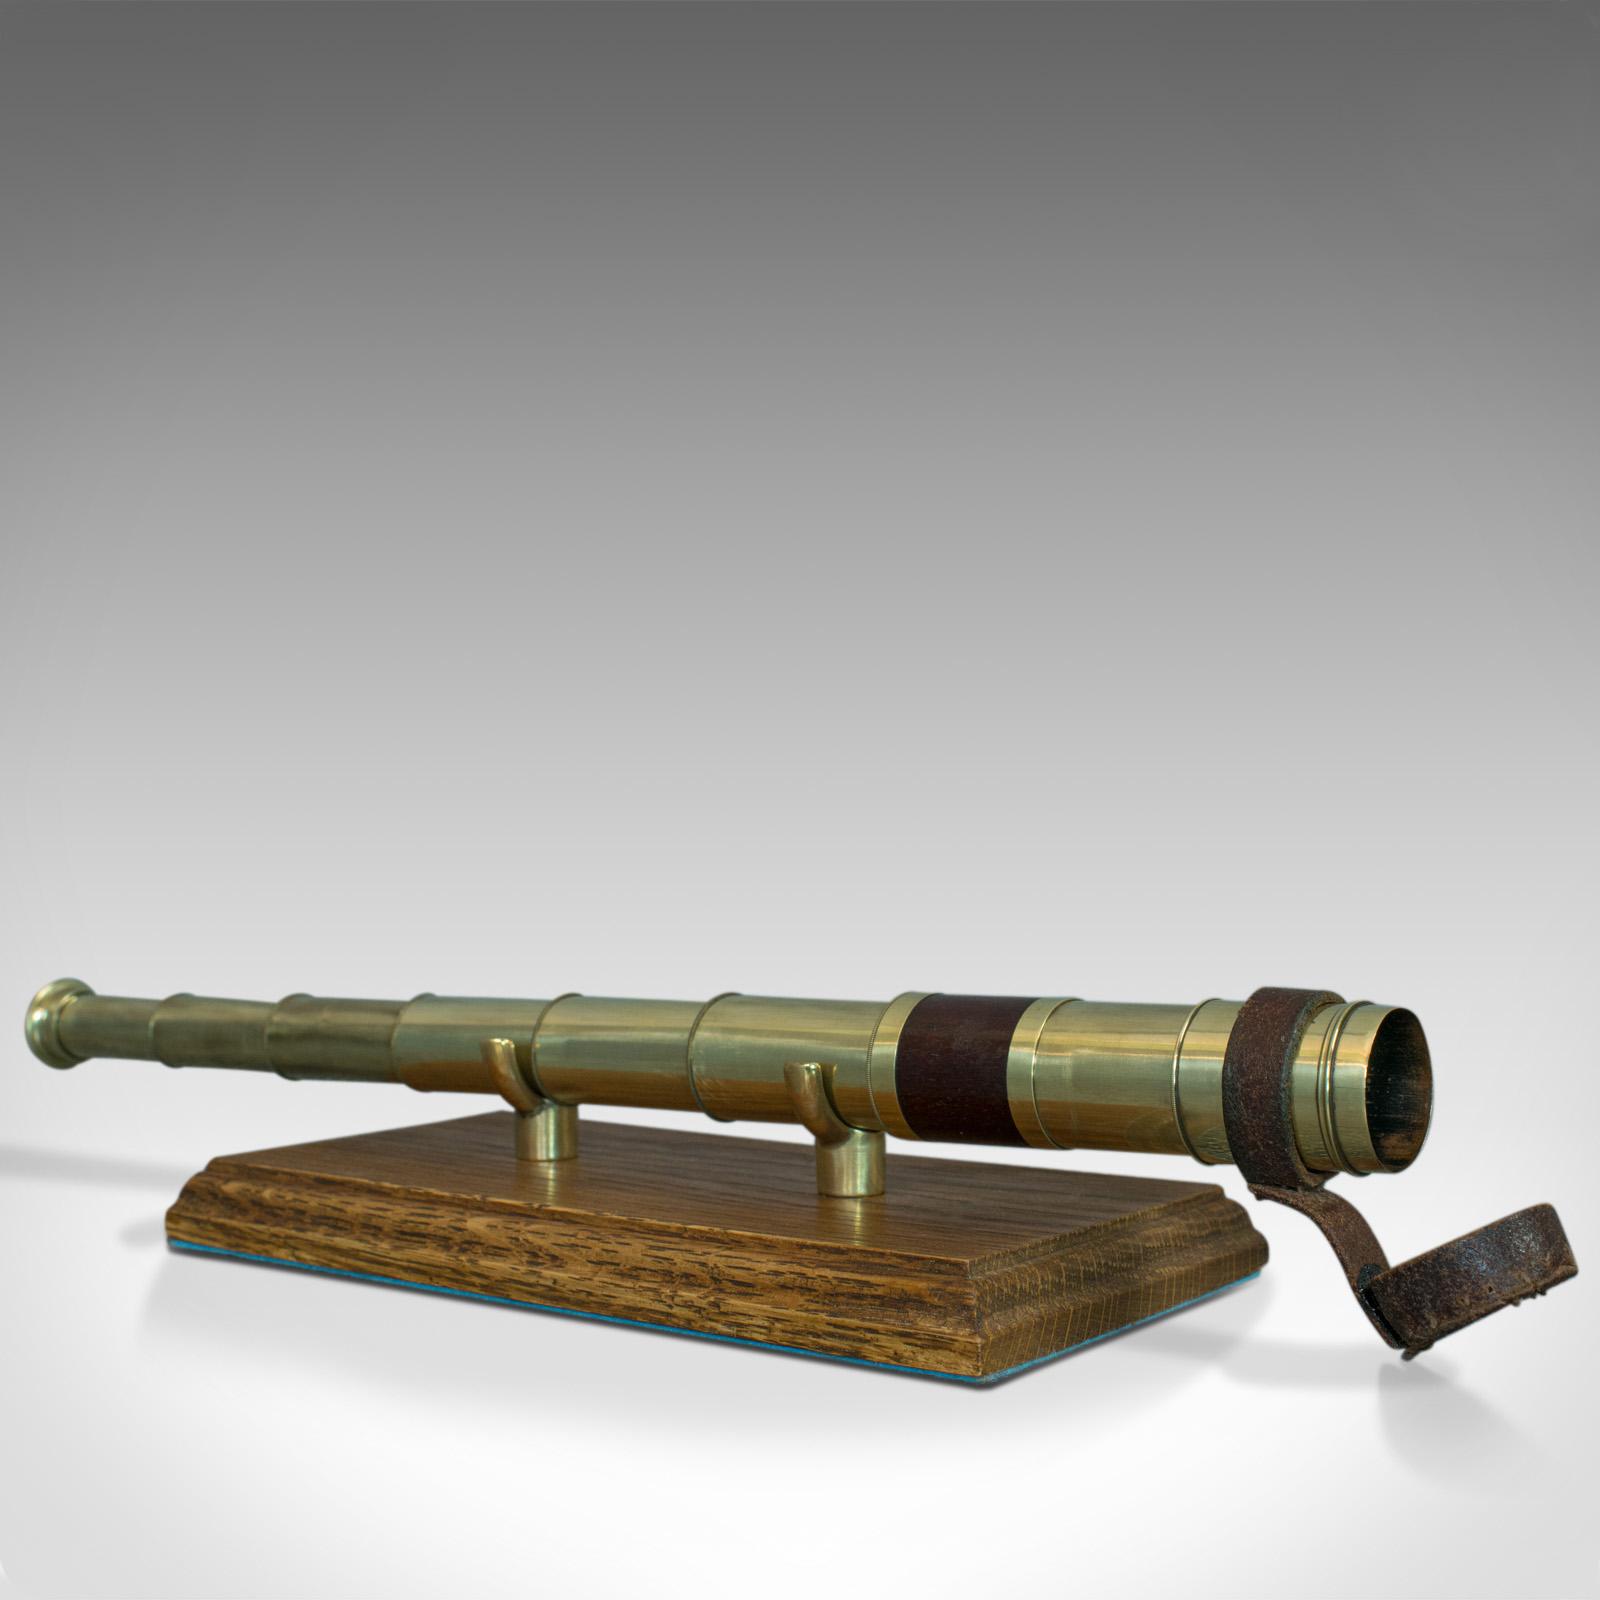 Antique, Pocket Telescope, 6 Draw, English, Compact, Negretti and Zambra, C.1860